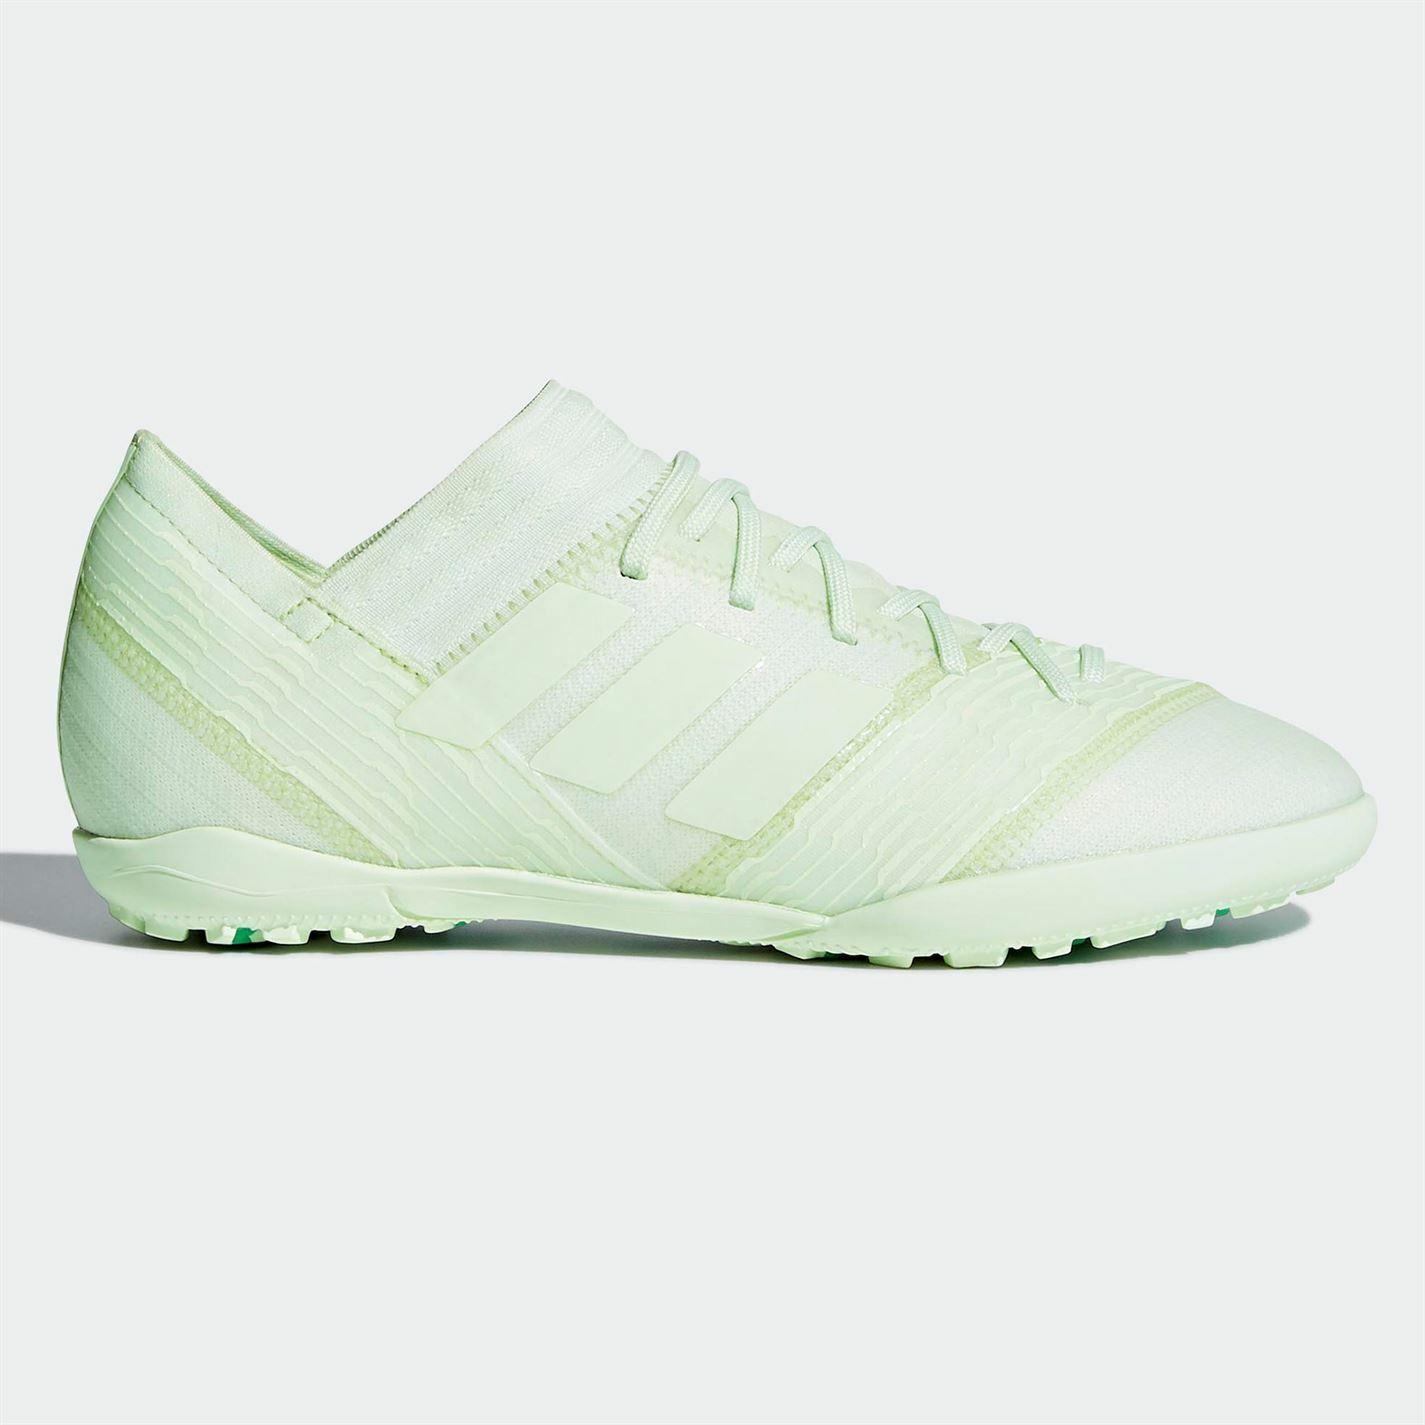 Adidas Nemeziz Tango 17.3 Astro Fußballschuhe Fußballschuhe Fußballschuhe Kinder Grün Fußball Schuhe 6b2877